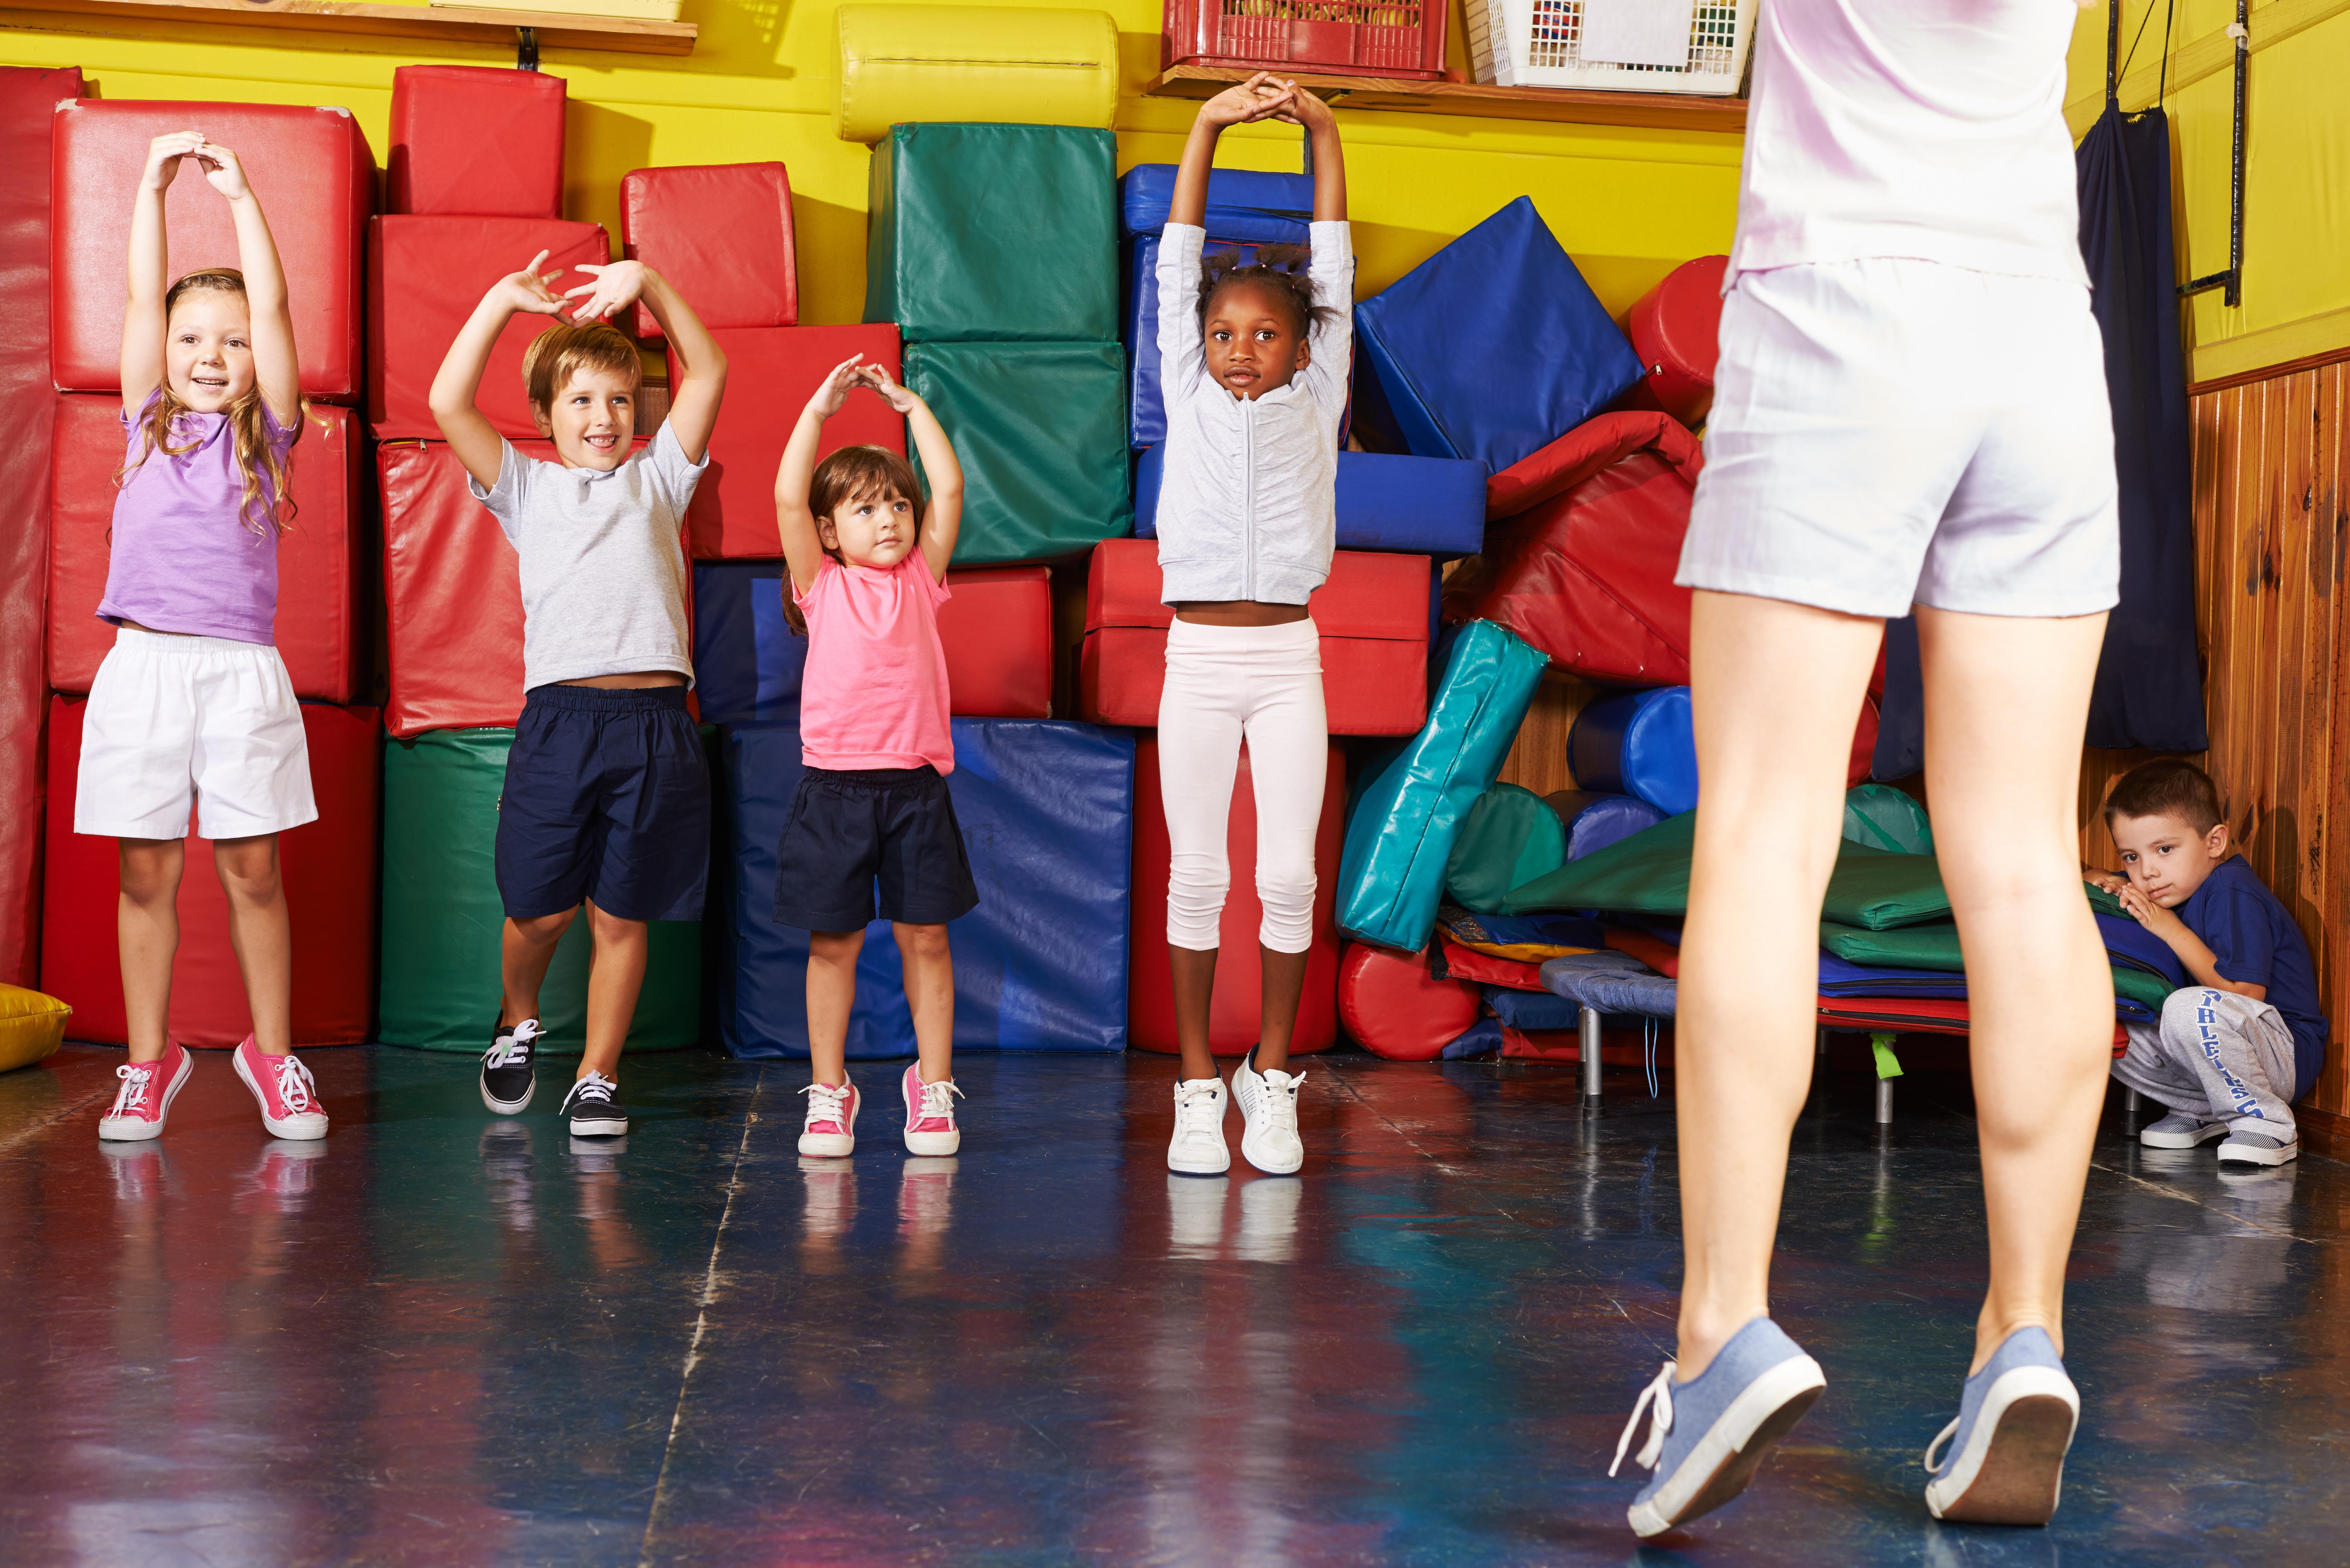 Kinder und Diabetes | Diabetes Ratgeber